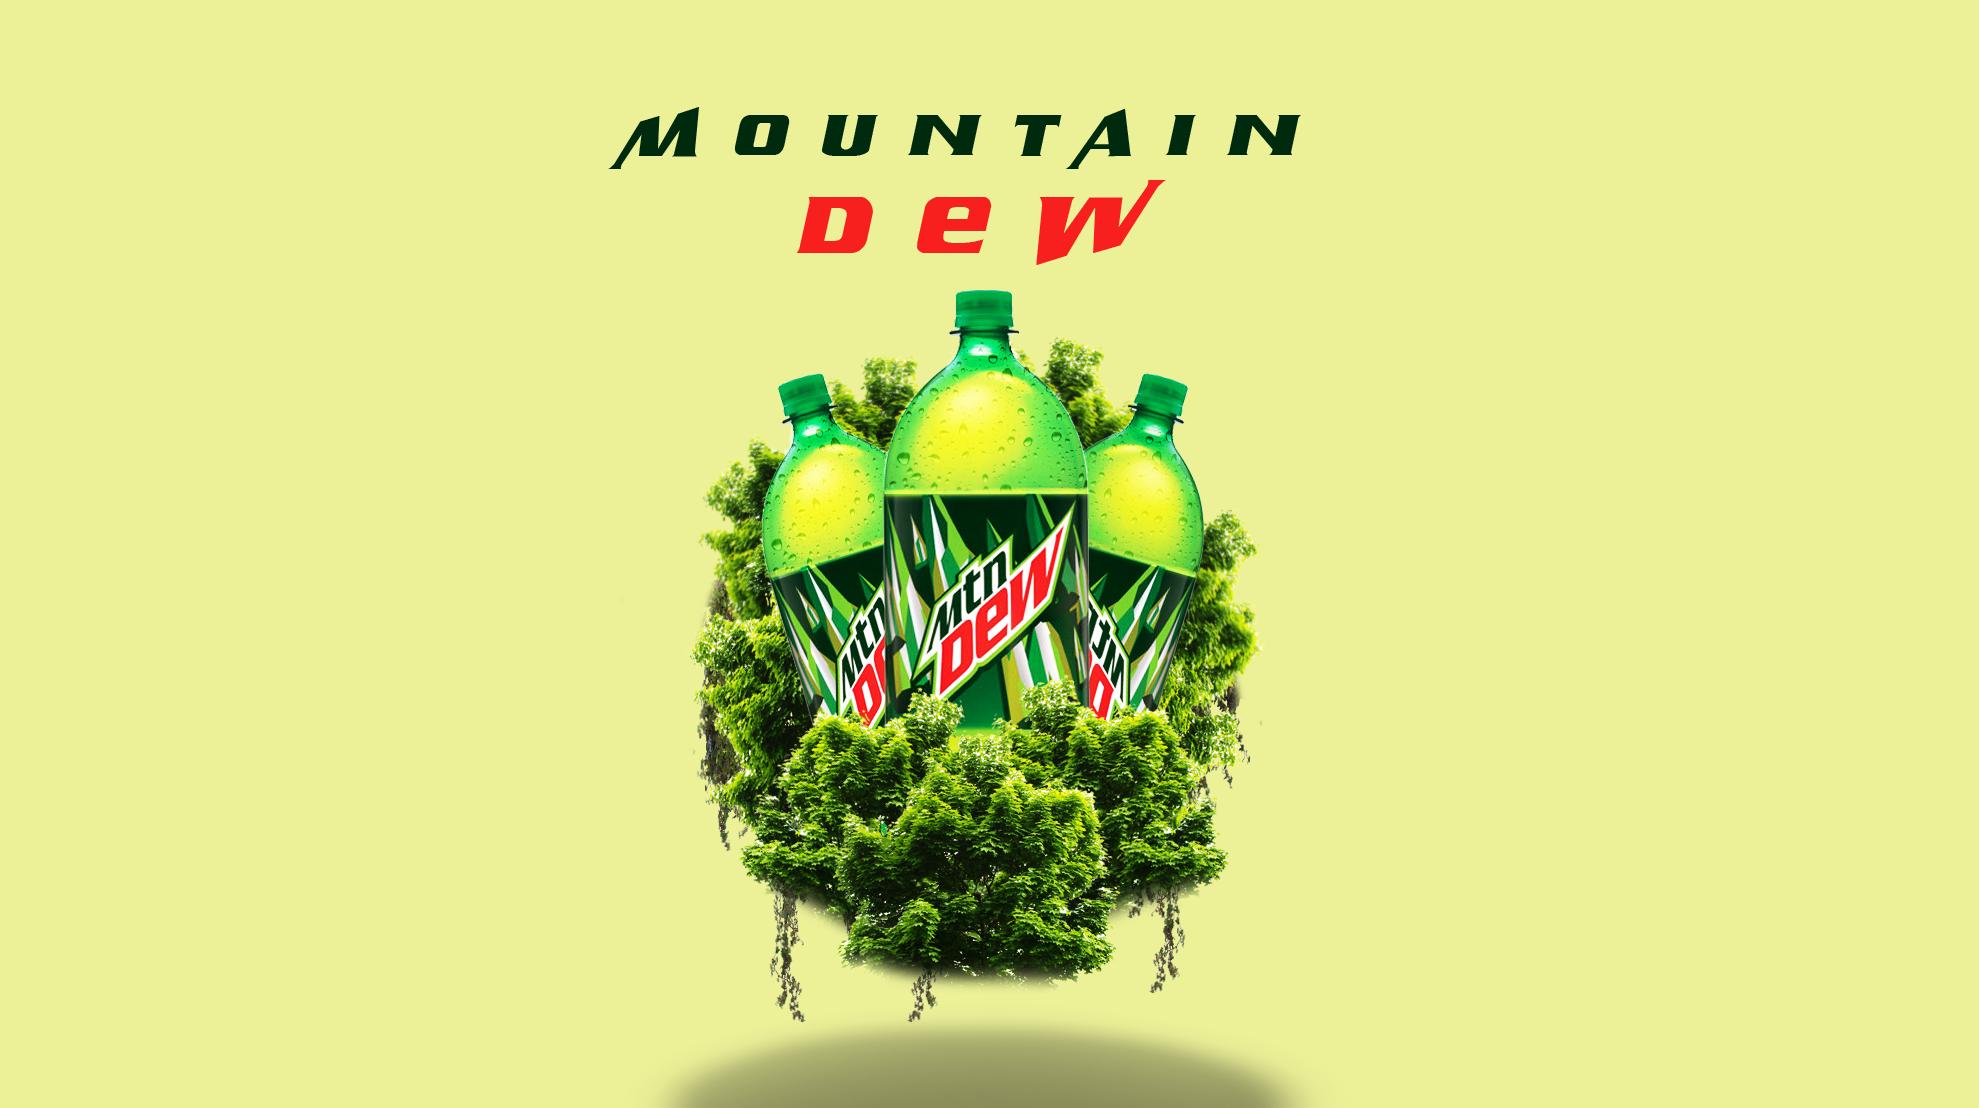 Mountain dew hd wallpaper background image 1979x1108 - Diet mountain dew wallpaper ...